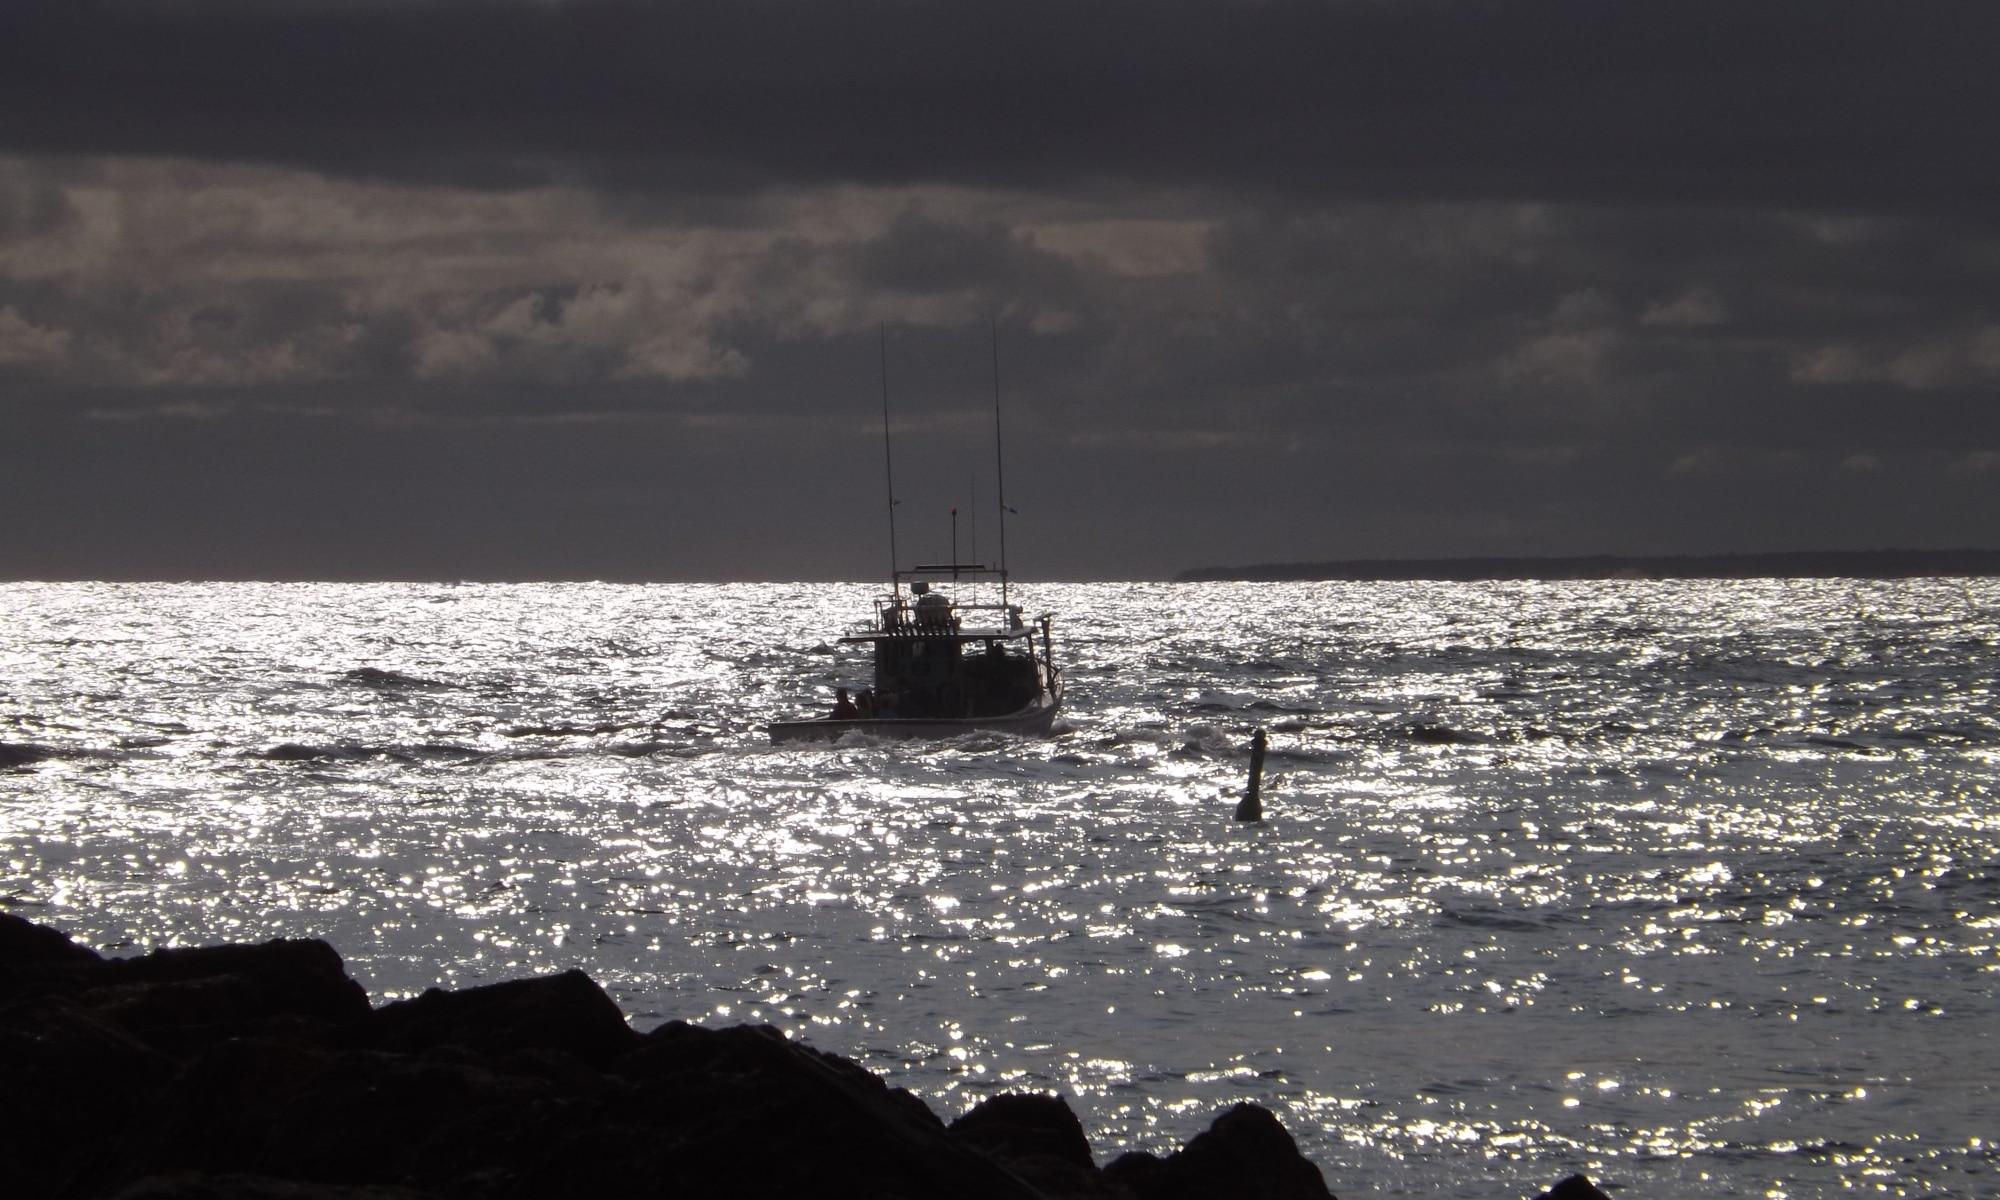 Fishing-Boat-at-North-Rustico-DSCF8377